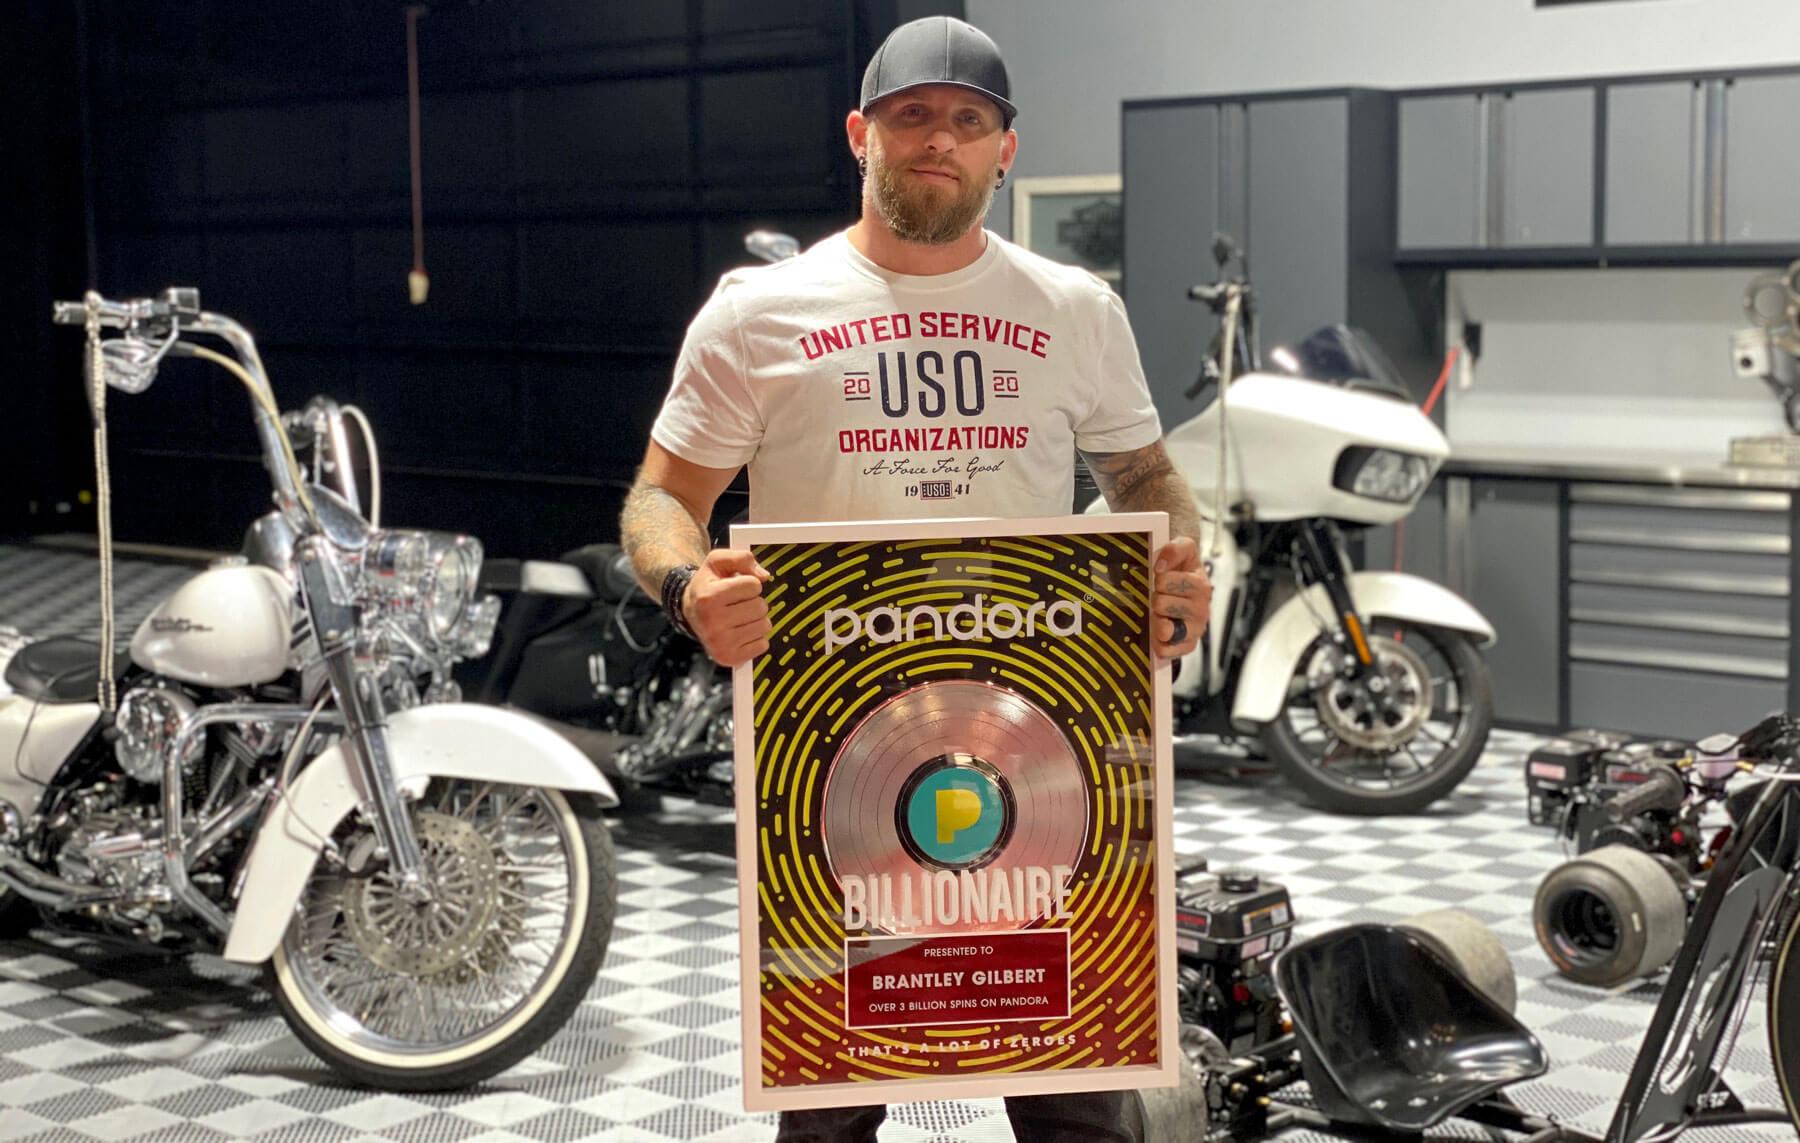 Brantley Gilbert shows his Pandora Billionaire award in his RaceDeck Free-Flow garage